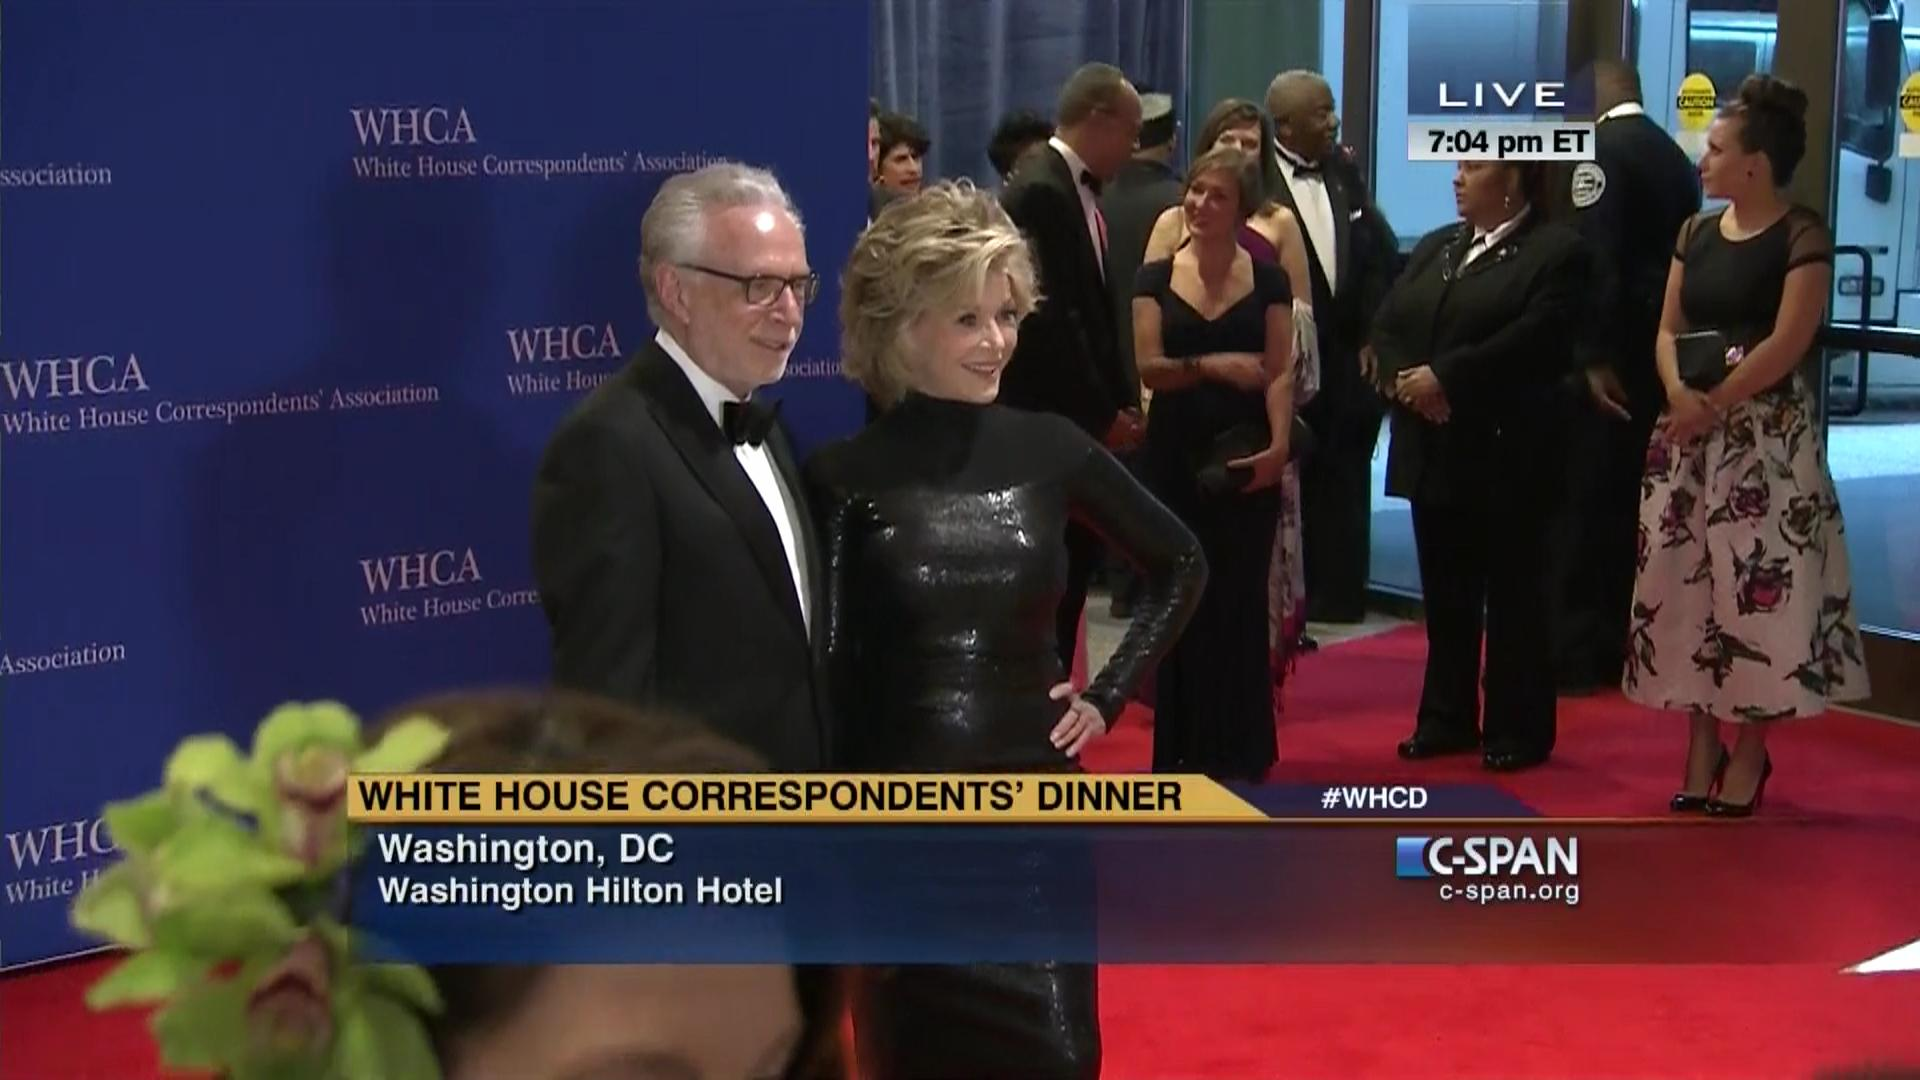 2015 white house correspondents' association dinner arrivals | c